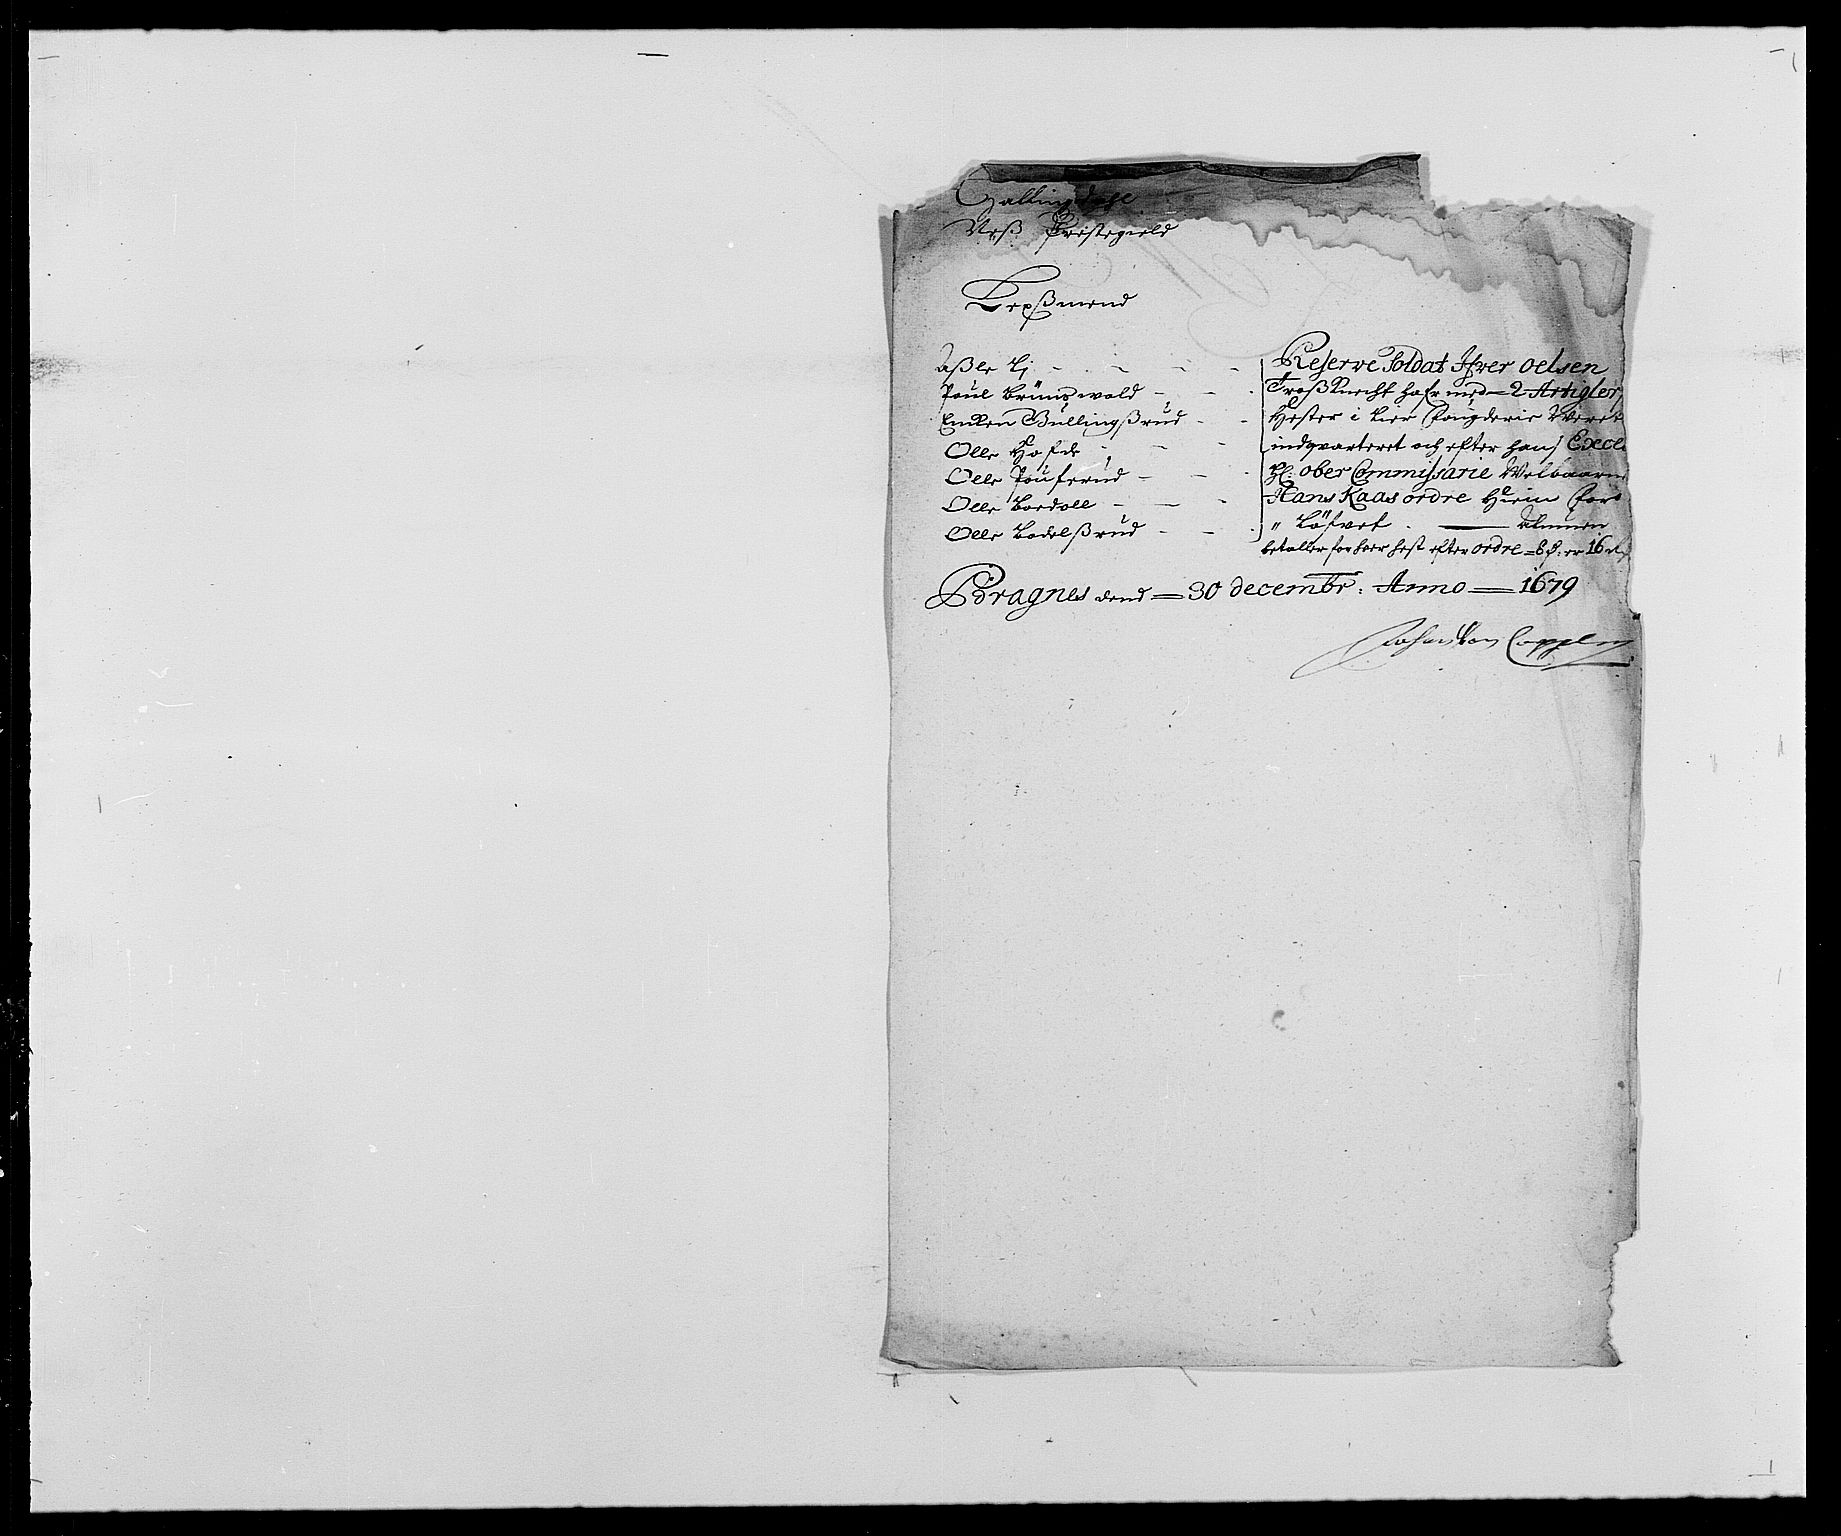 RA, Rentekammeret inntil 1814, Reviderte regnskaper, Fogderegnskap, R27/L1686: Fogderegnskap Lier, 1678-1686, s. 180